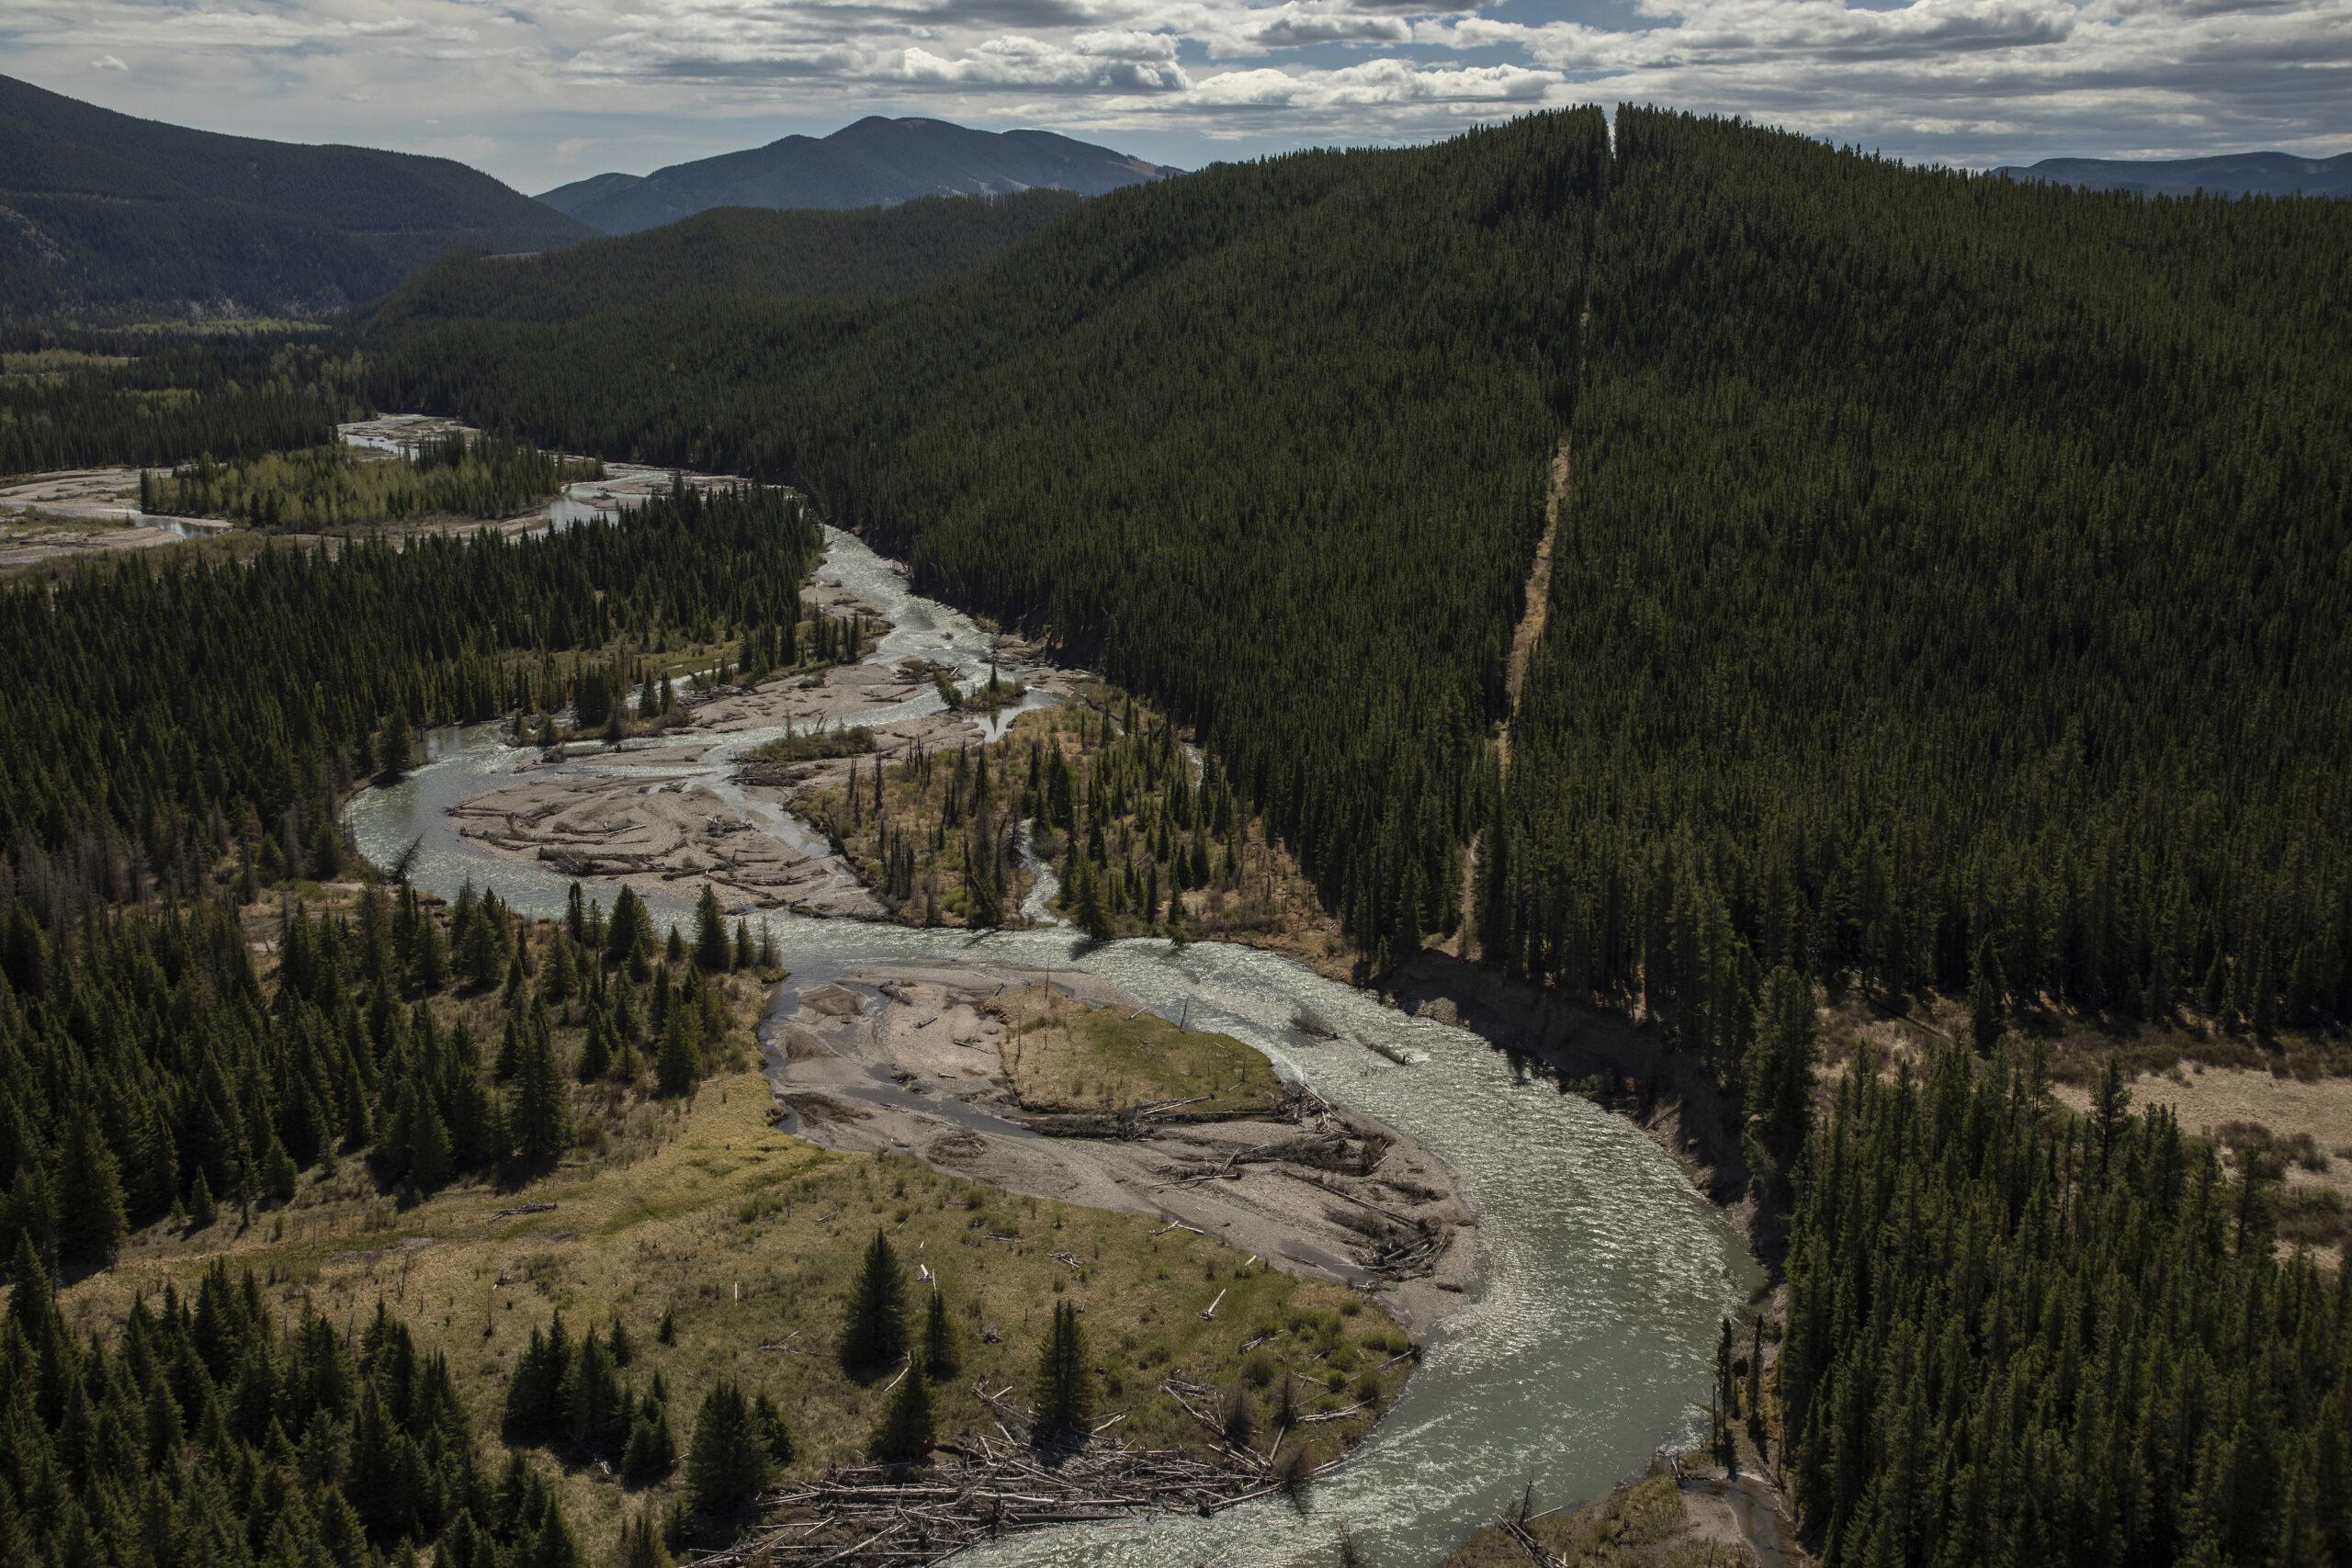 cutline running along mountain beside river